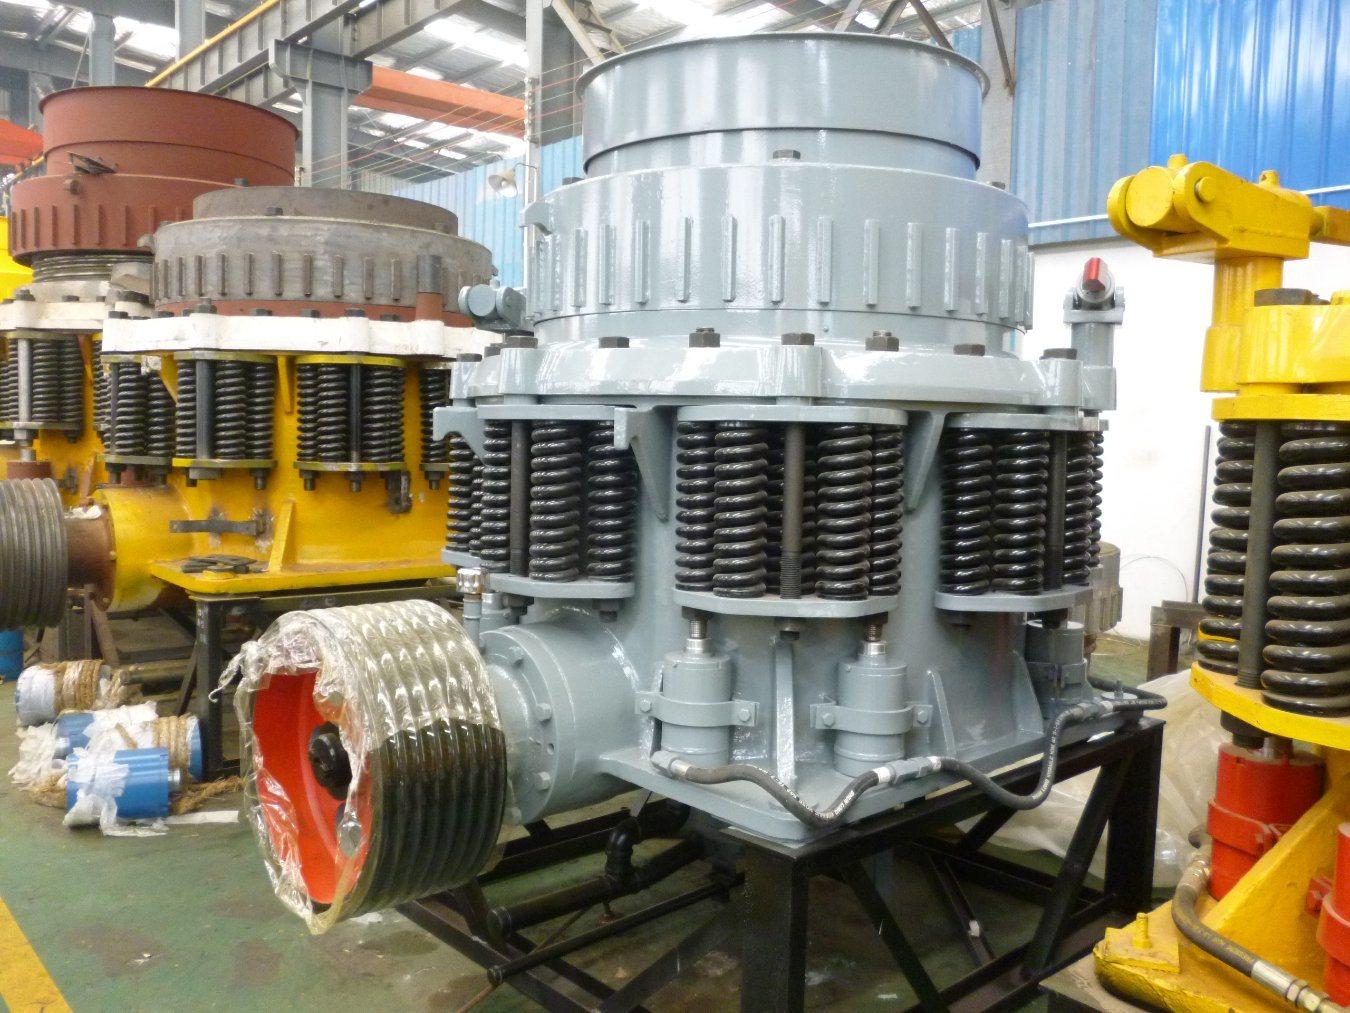 Nordberg Symons Cone Crusher for Copper Ore Crushing Plant in Peru, South America